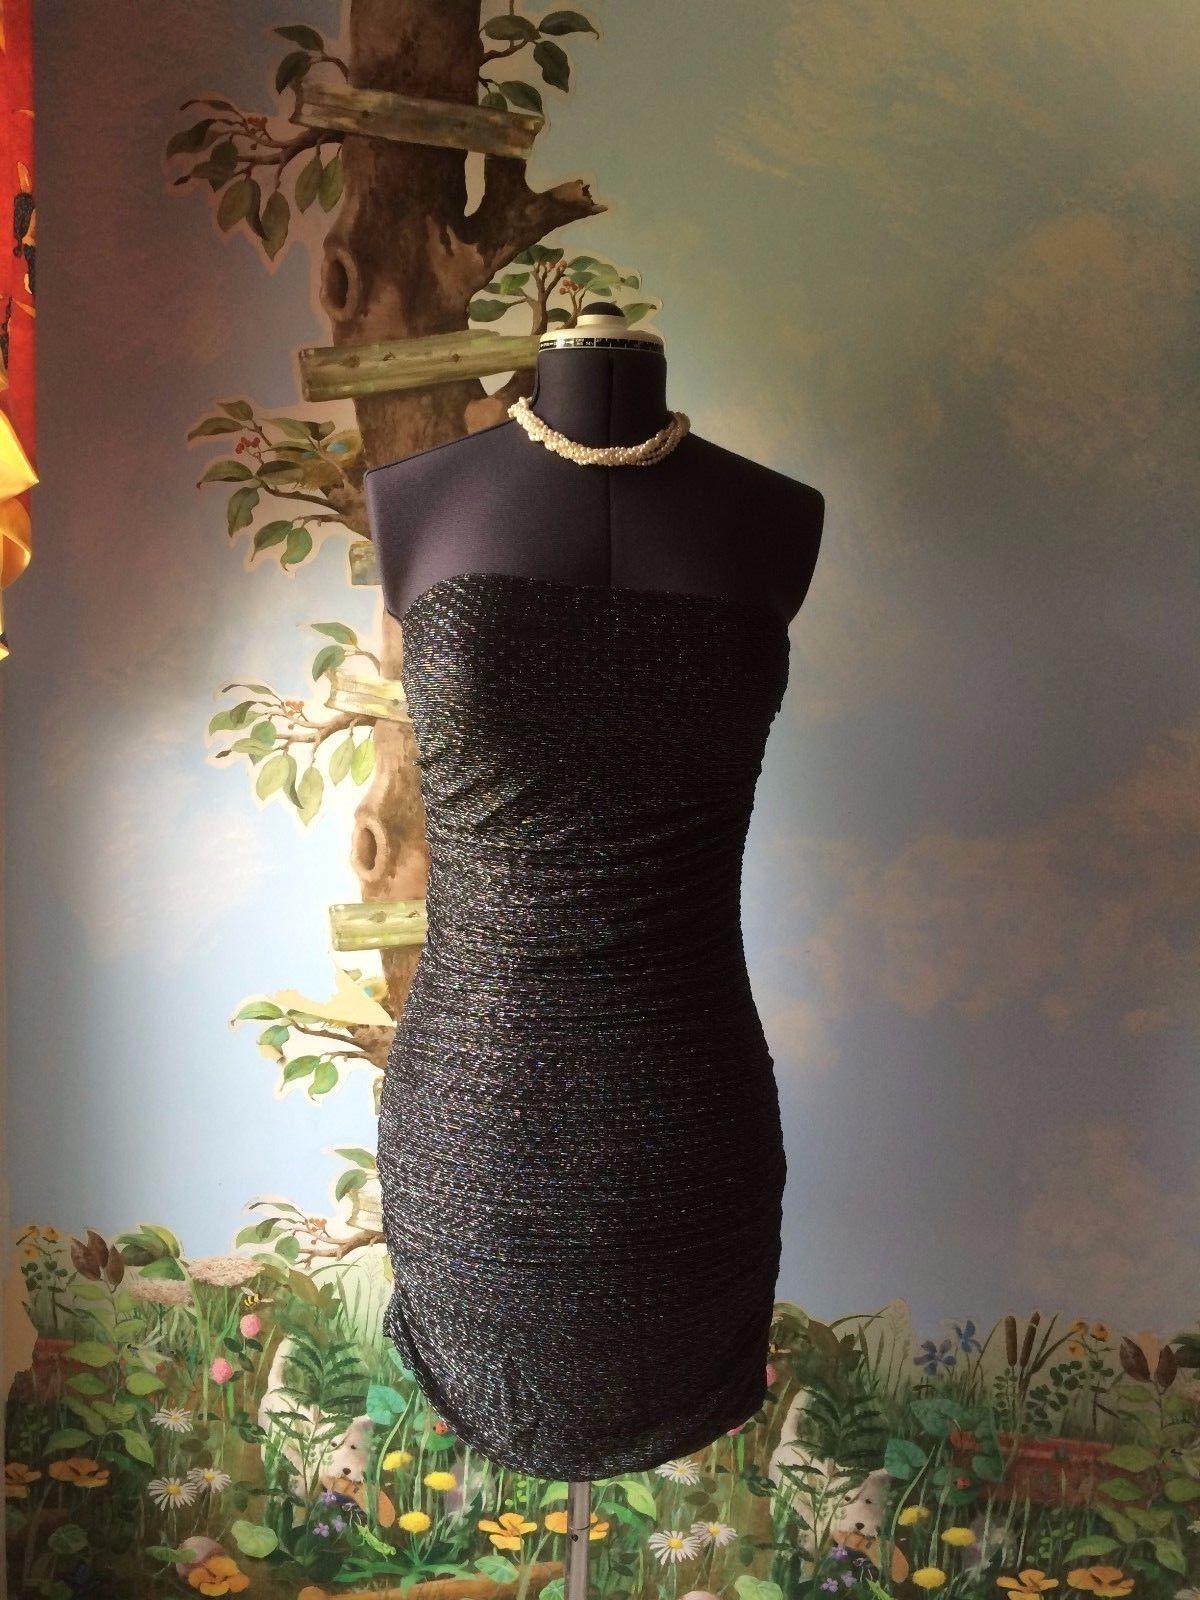 Express Women's Black & Silver Strapless Cocktail Dress SZ M NWT image 2